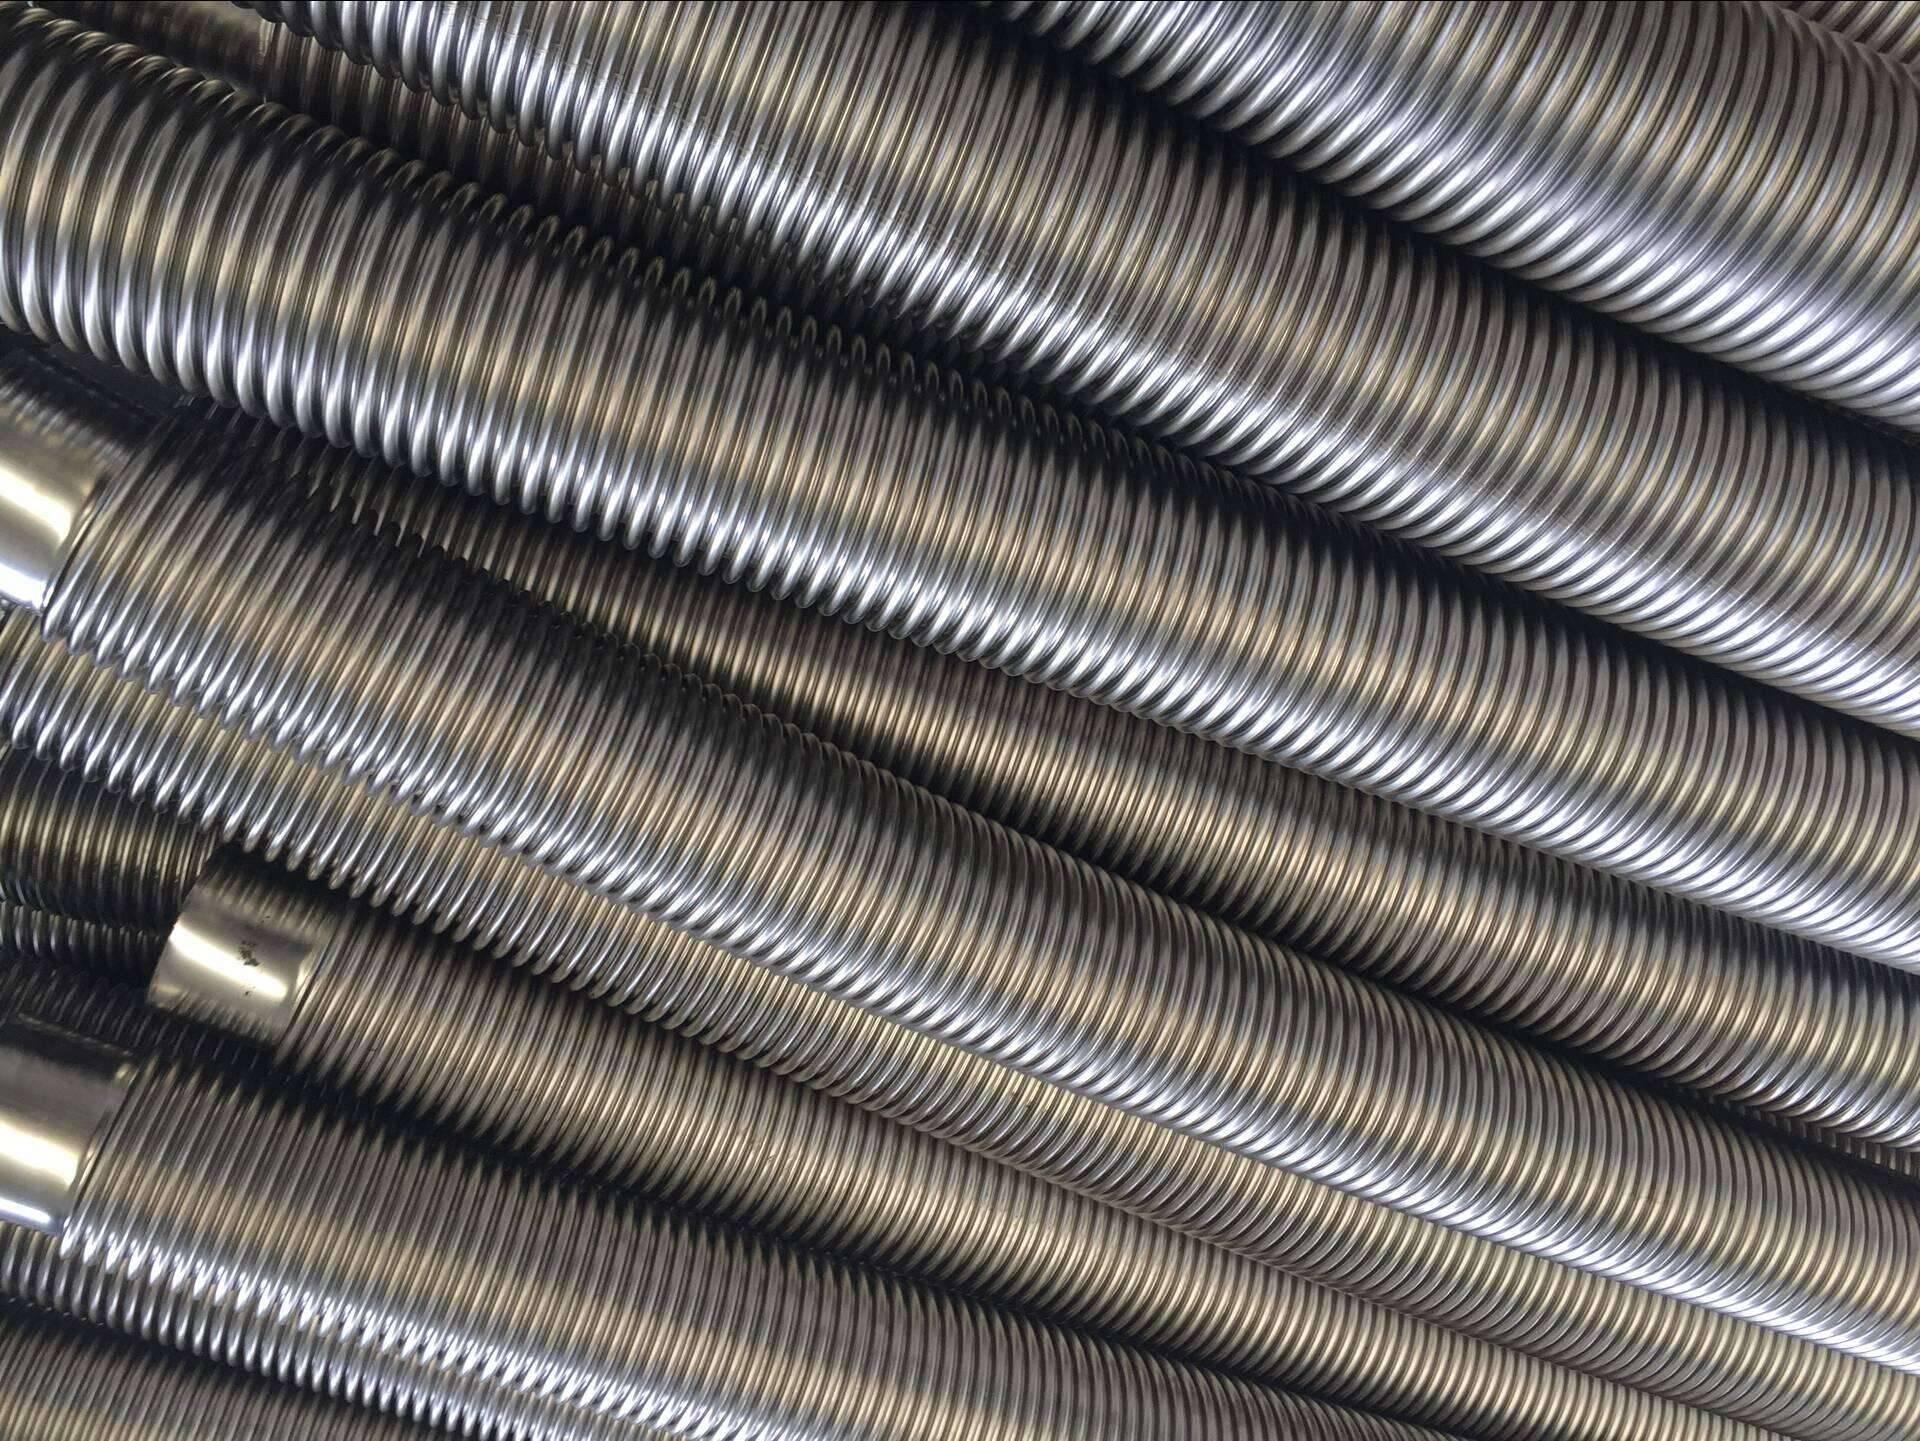 Annular convoluted flexible metal hoses